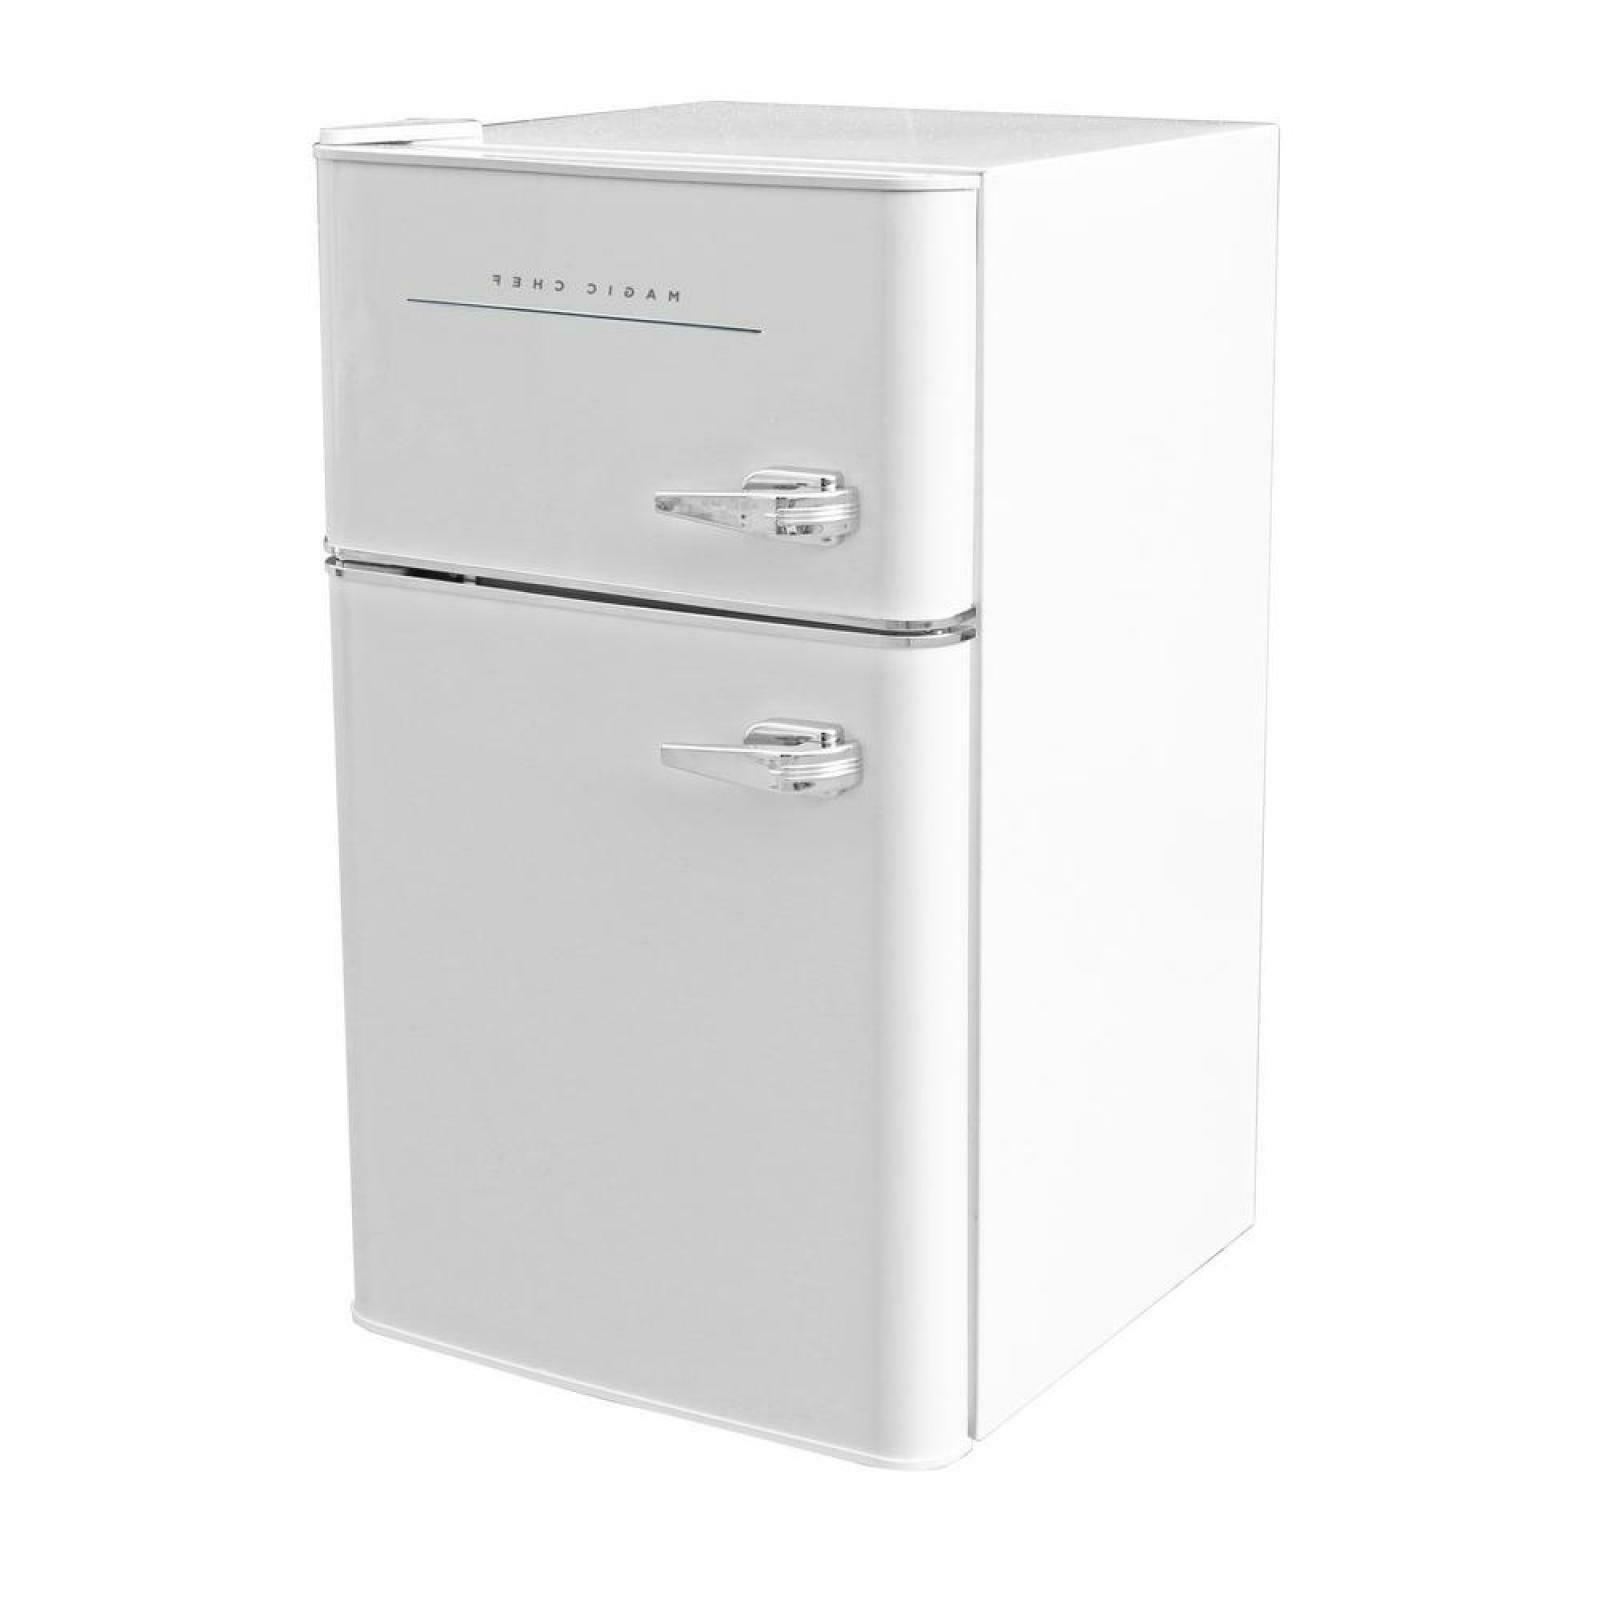 Retro Mini Freezer ft 2-Door Dorm